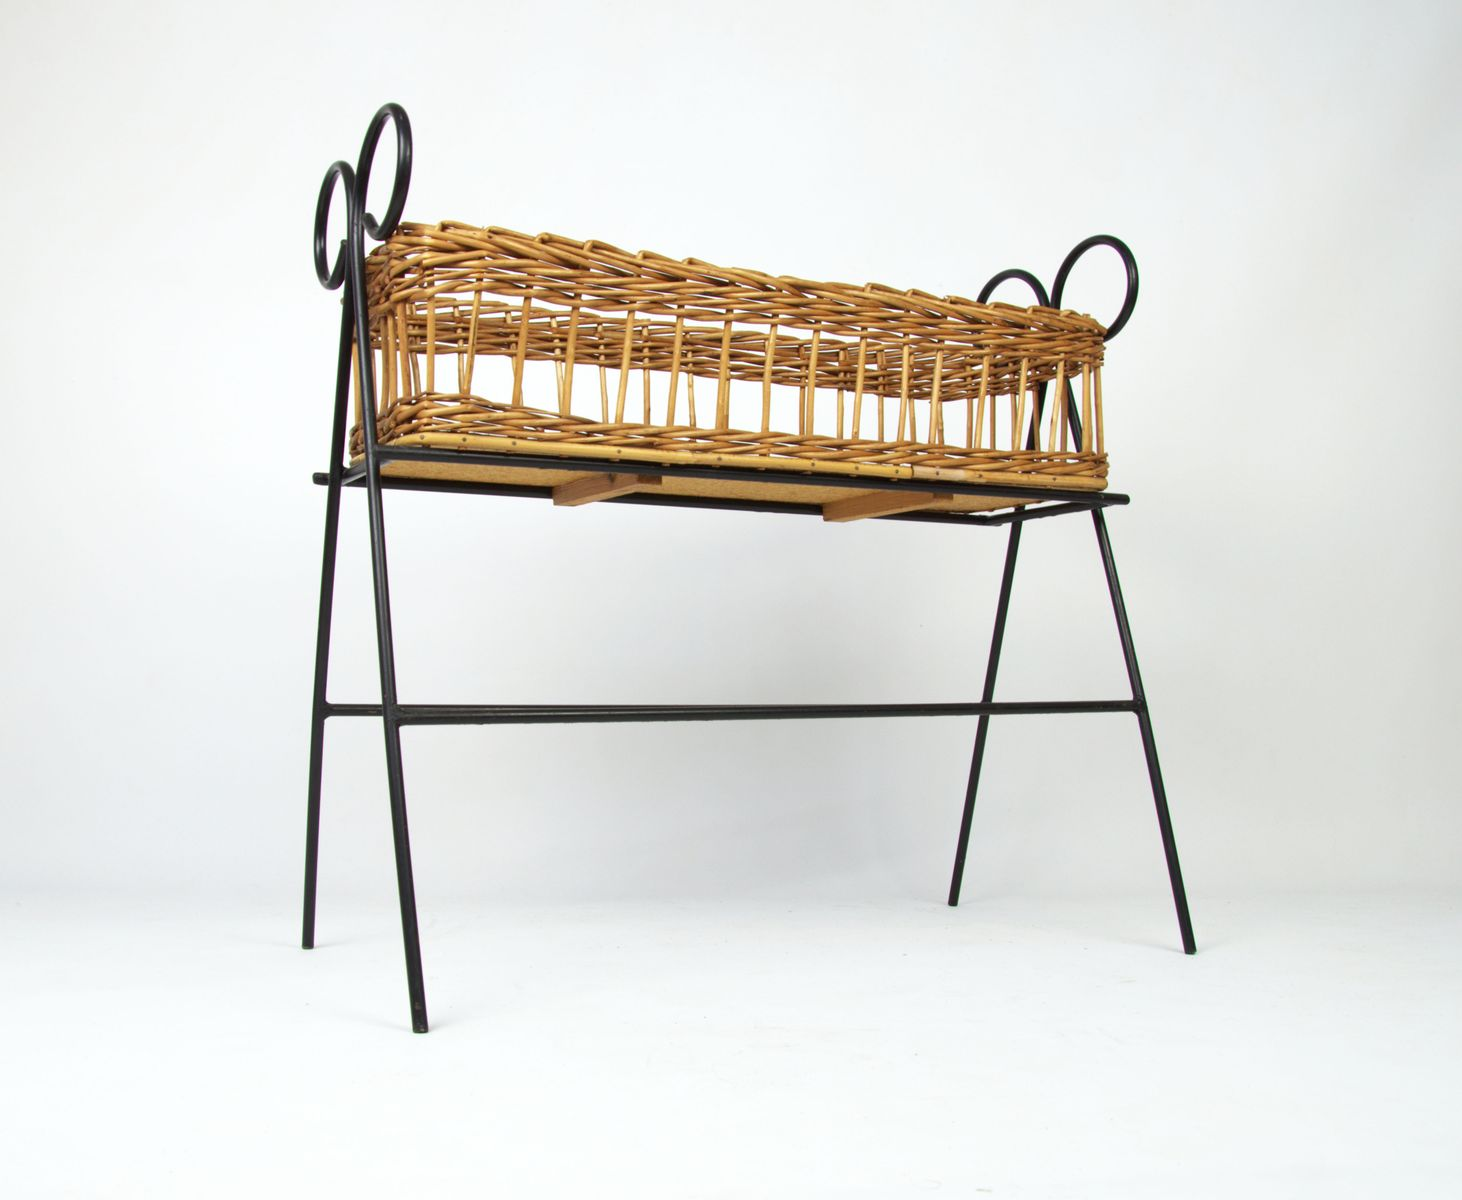 Panier d coratif vintage en osier 1970s en vente sur pamono - Panier decoratif osier ...